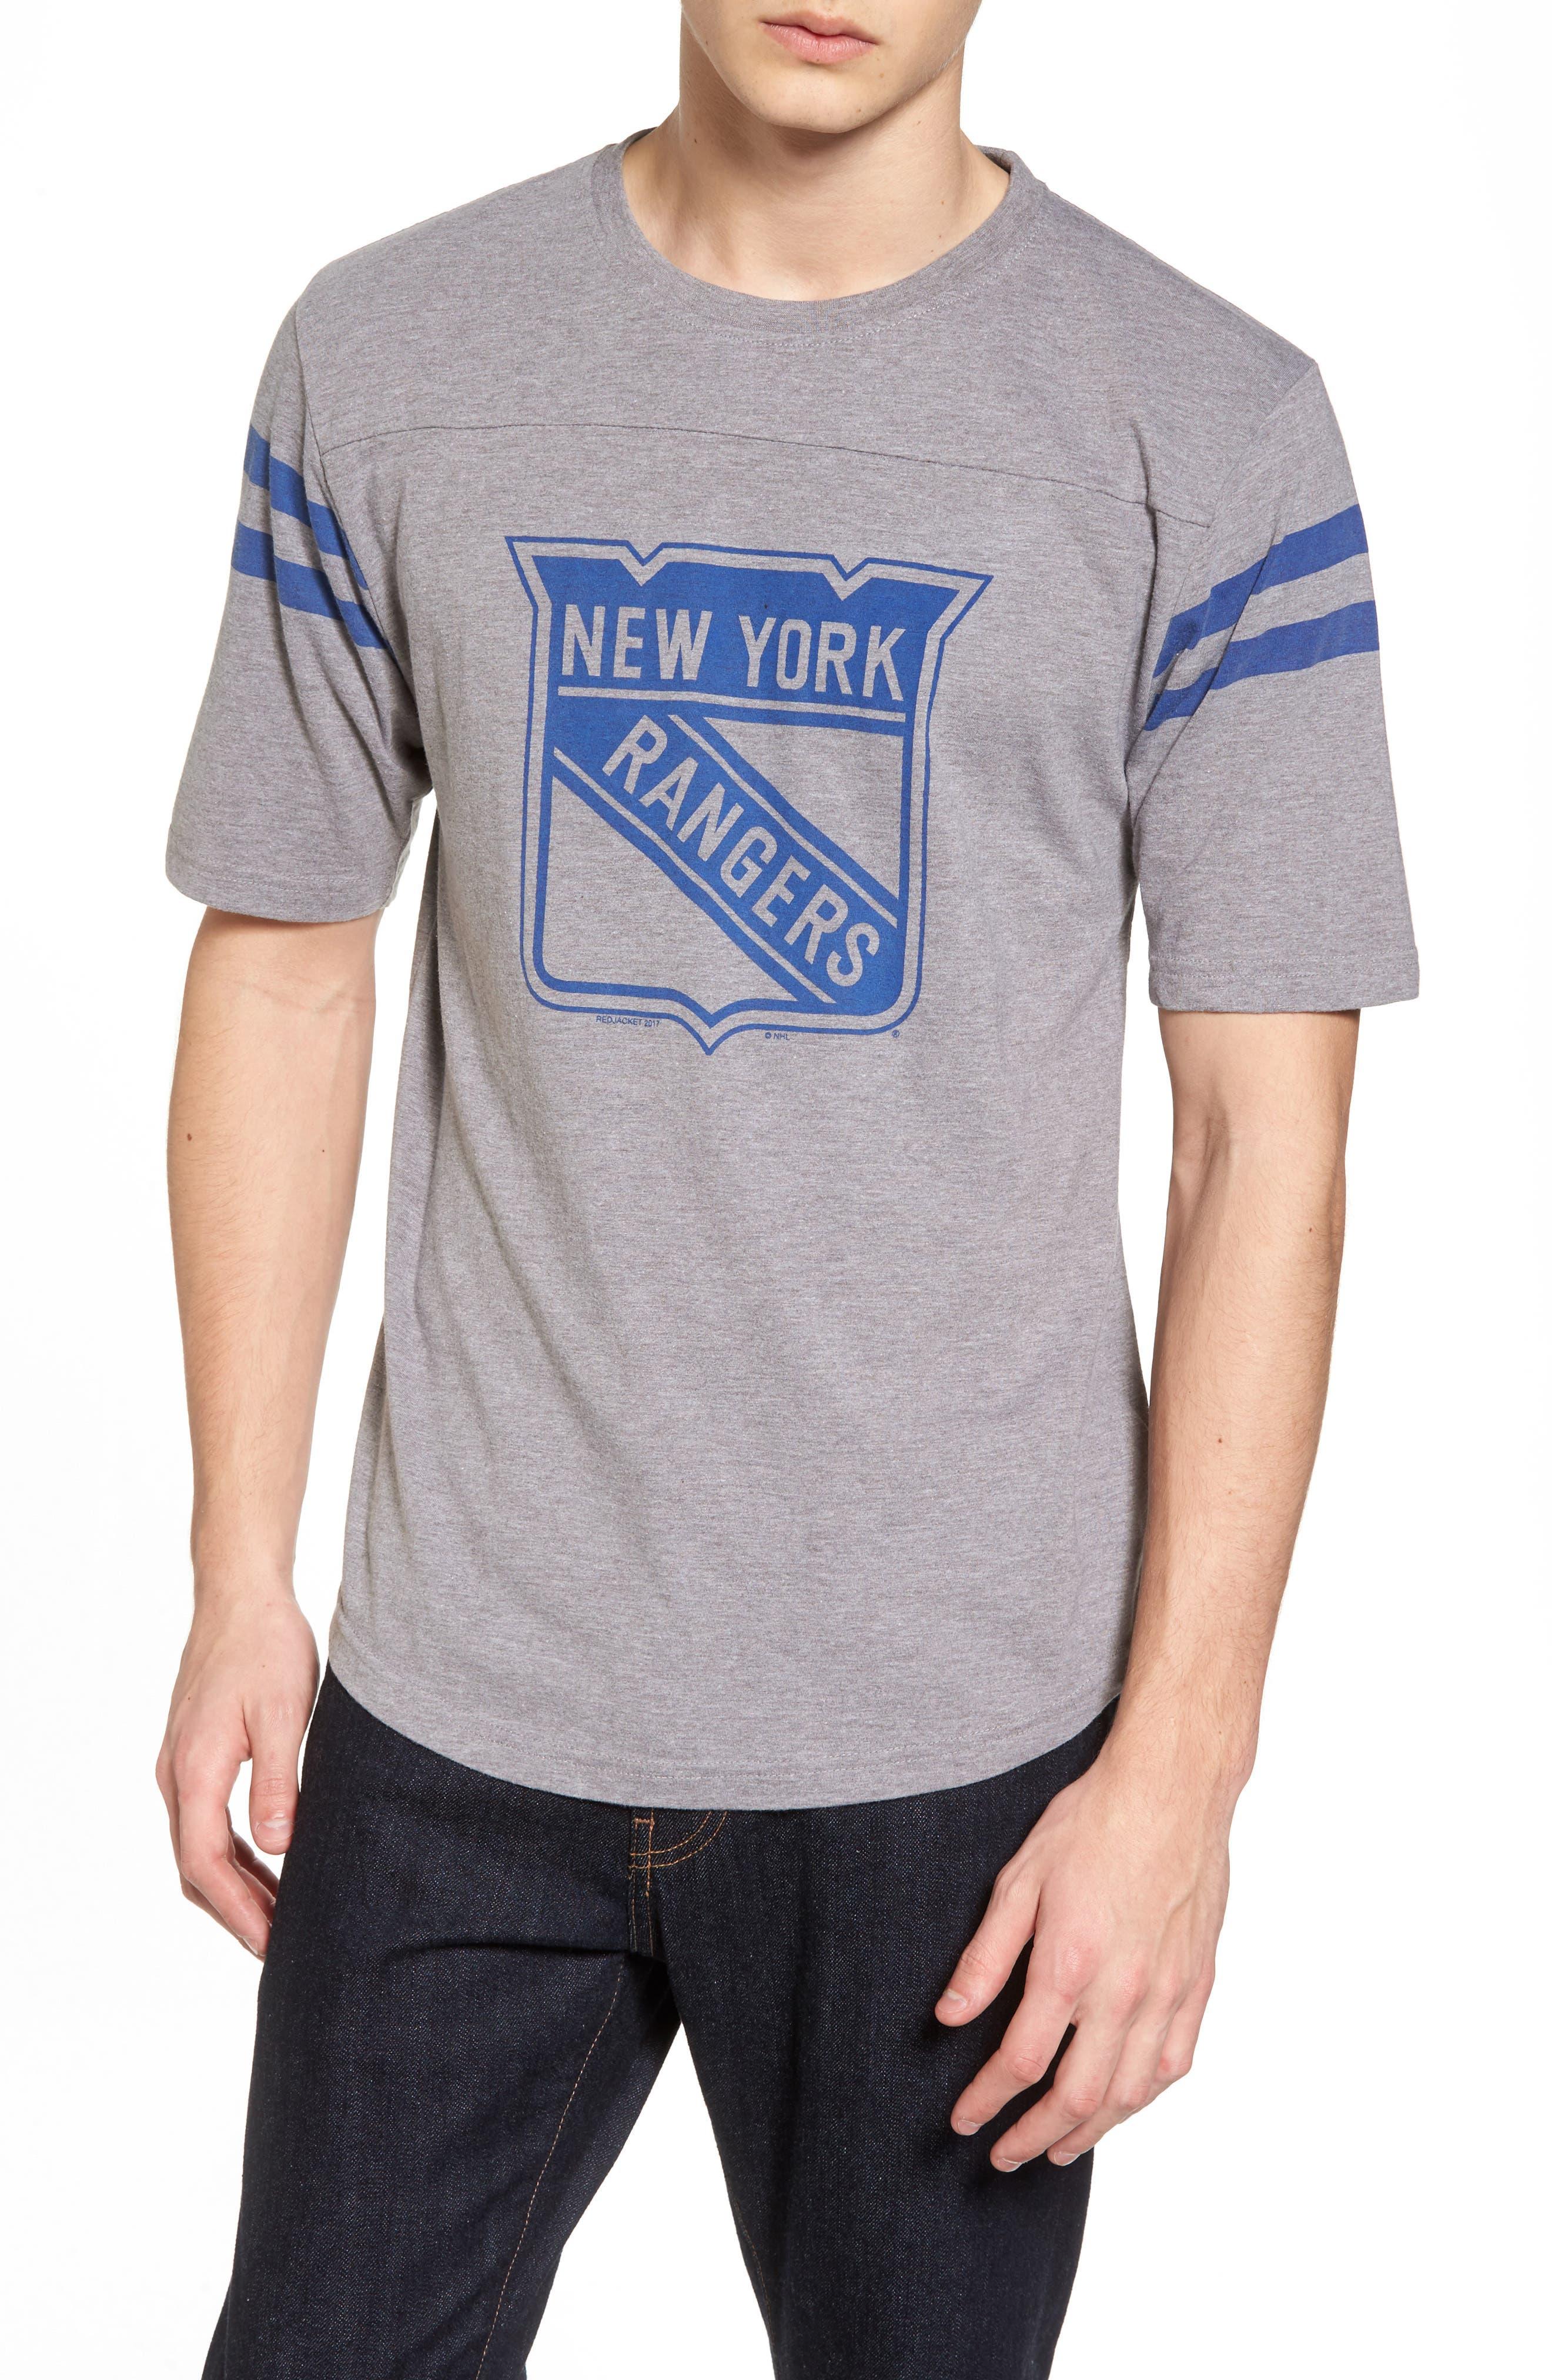 Crosby New York Rangers T-Shirt,                             Main thumbnail 1, color,                             073